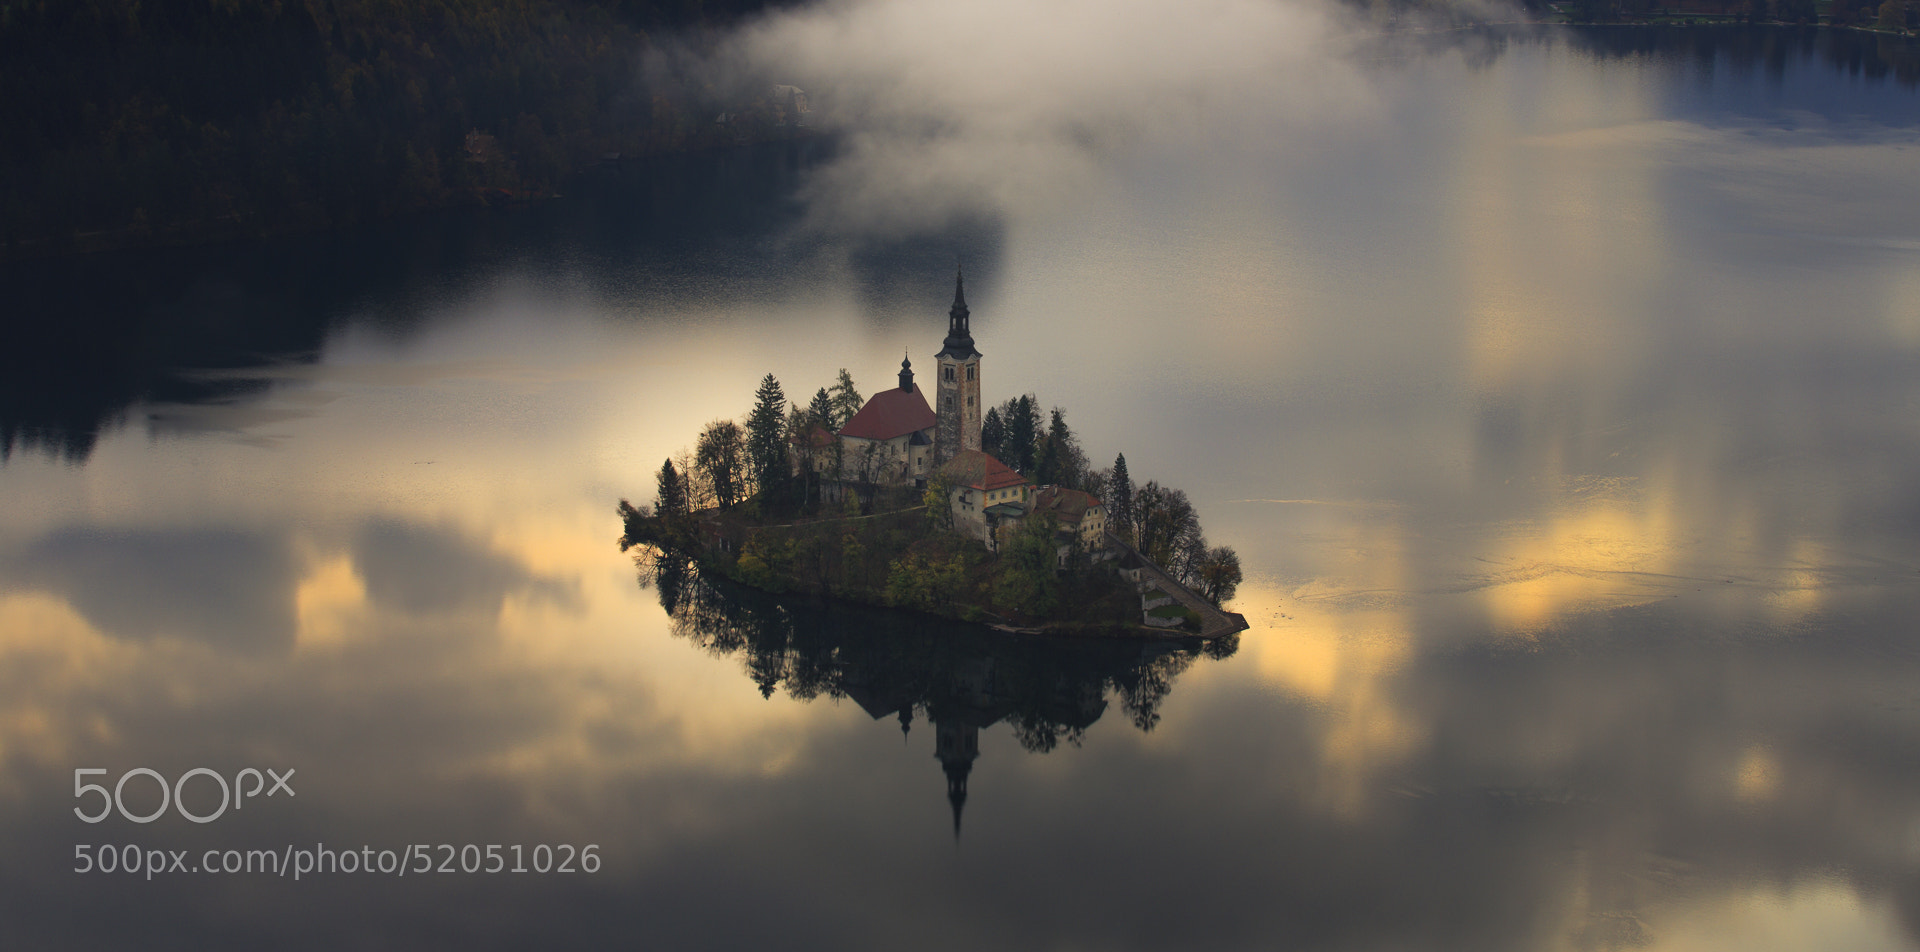 Photograph Floating Island by Jure Batagelj on 500px